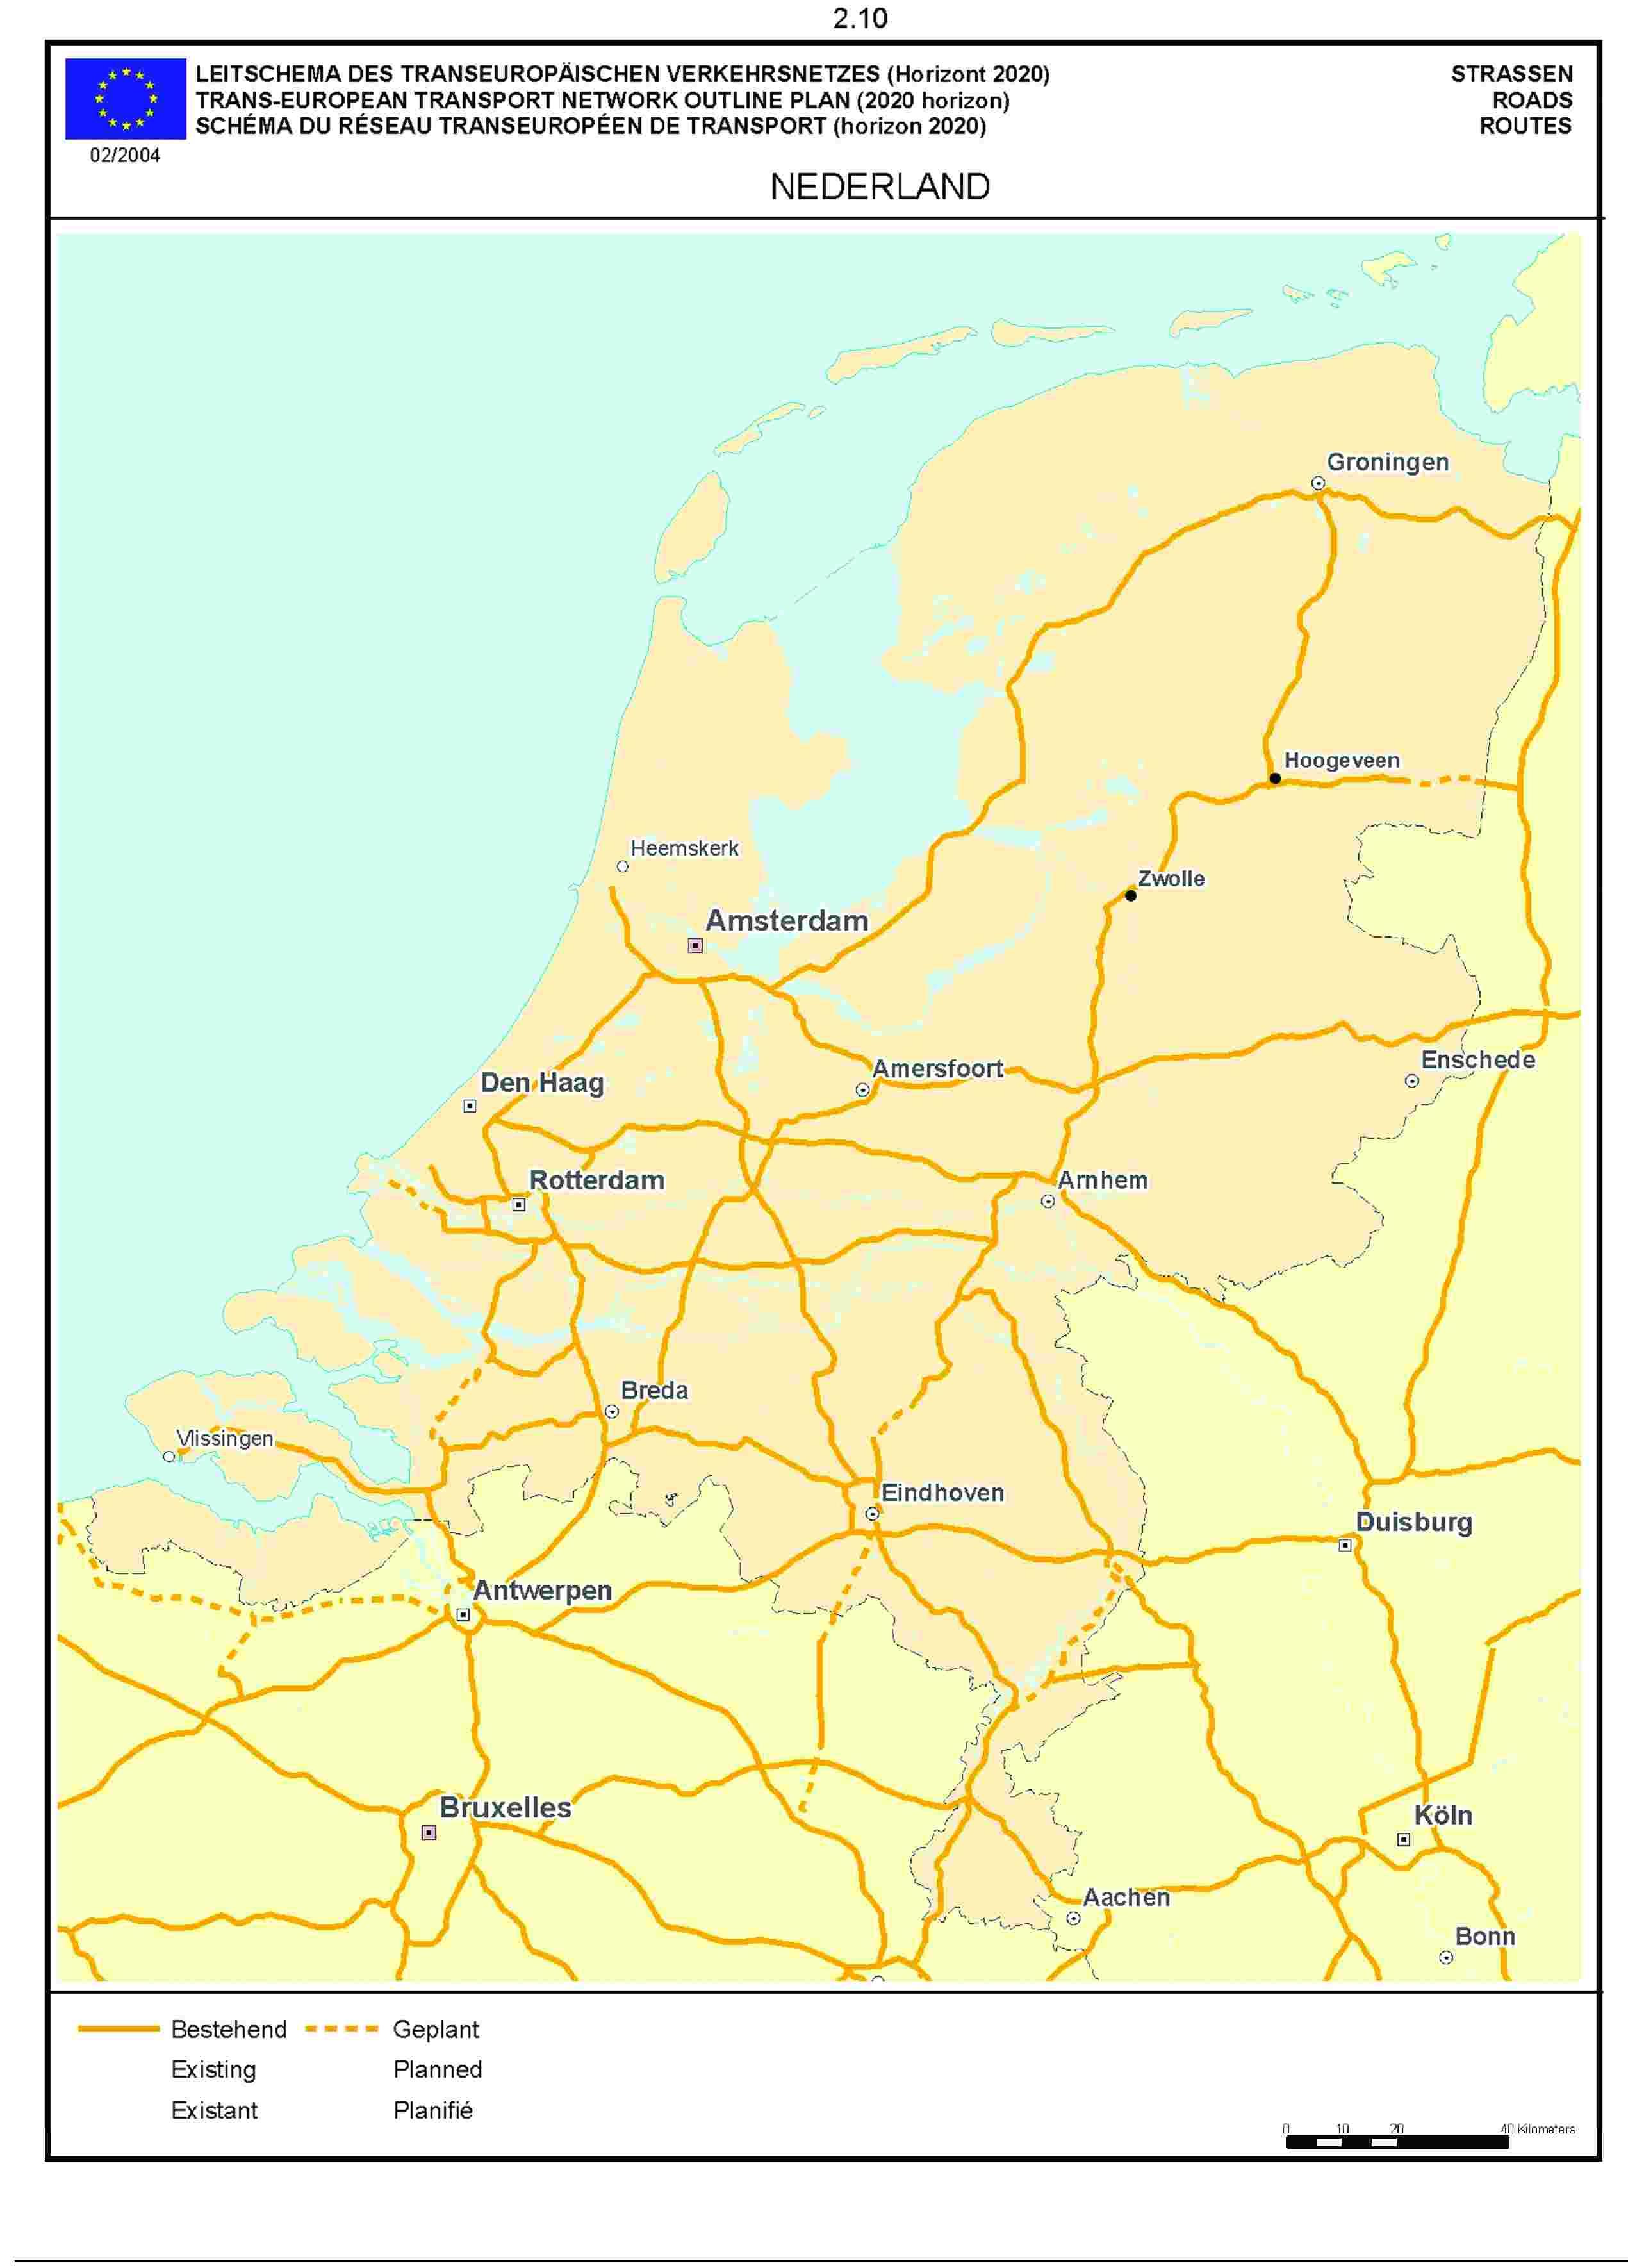 2.10LEITSCHEMA DES TRANSEUROPÄISCHEN VERKEHRSNETZES (Horizont 2020) STRASSENTRANS-EUROPEAN TRANSPORT NETWORK OUTLINE PLAN (2020 horizon) ROADSSCHÉMA DU RÉSEAU TRANSEUROPÉEN DE TRANSPORT (horizon 2020) ROUTE02/2004NEDERLAND